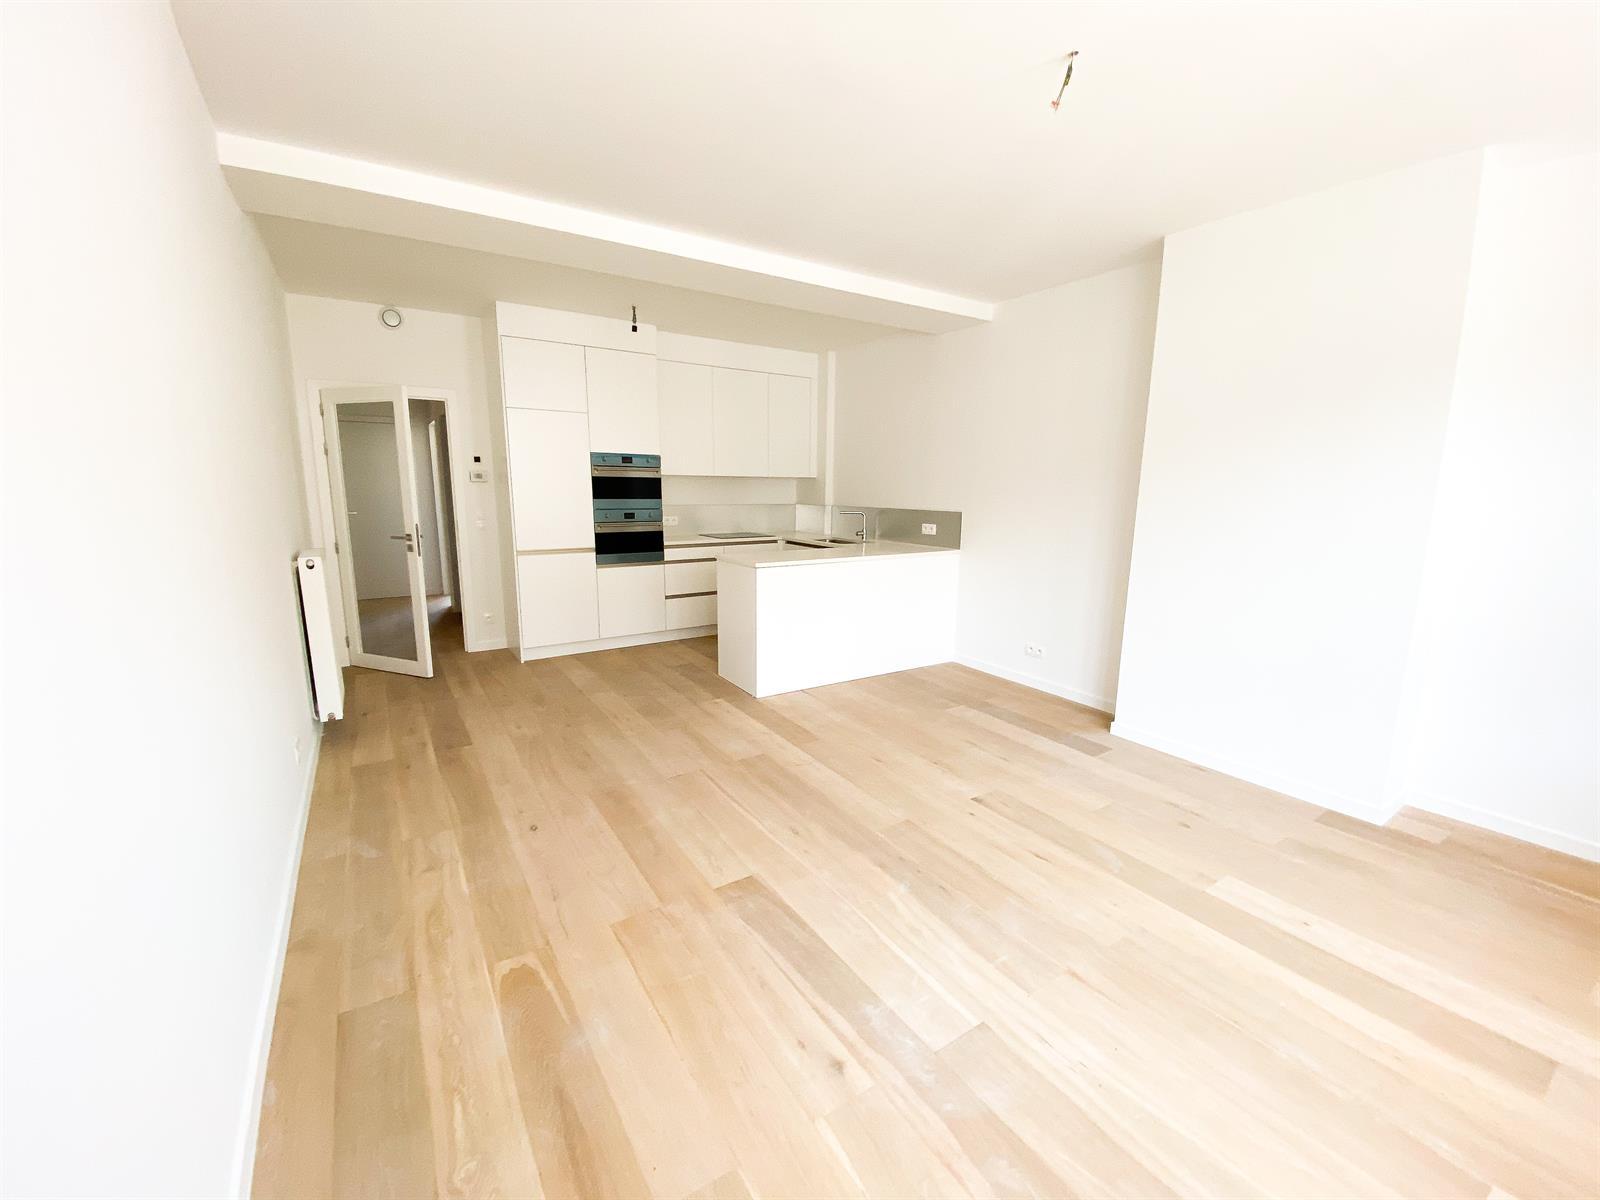 Duplex - Liège - #4045842-1